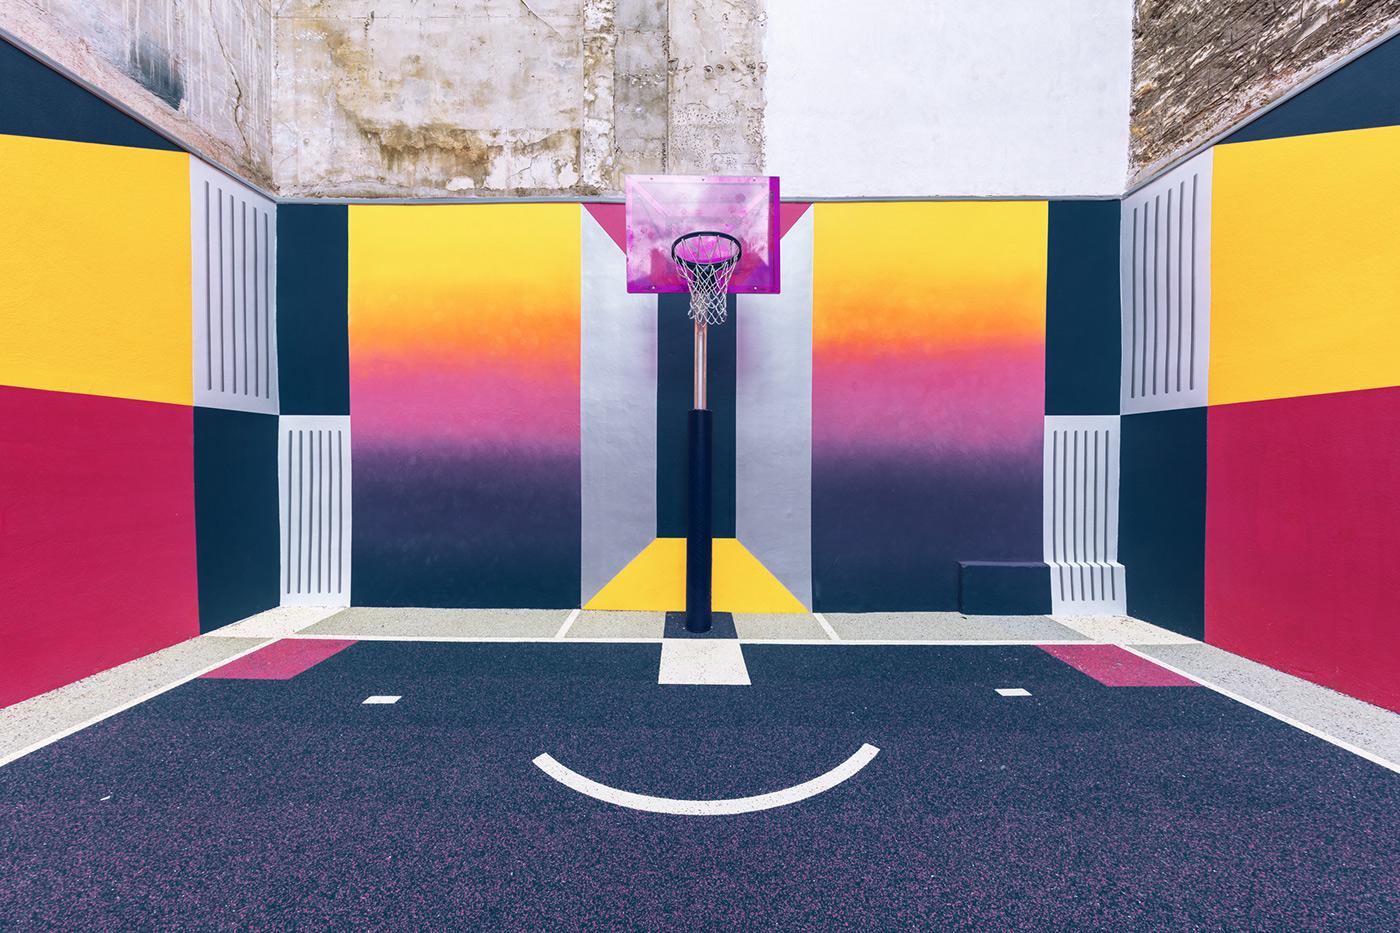 basketball Paris pigalle Nike Playground play summer